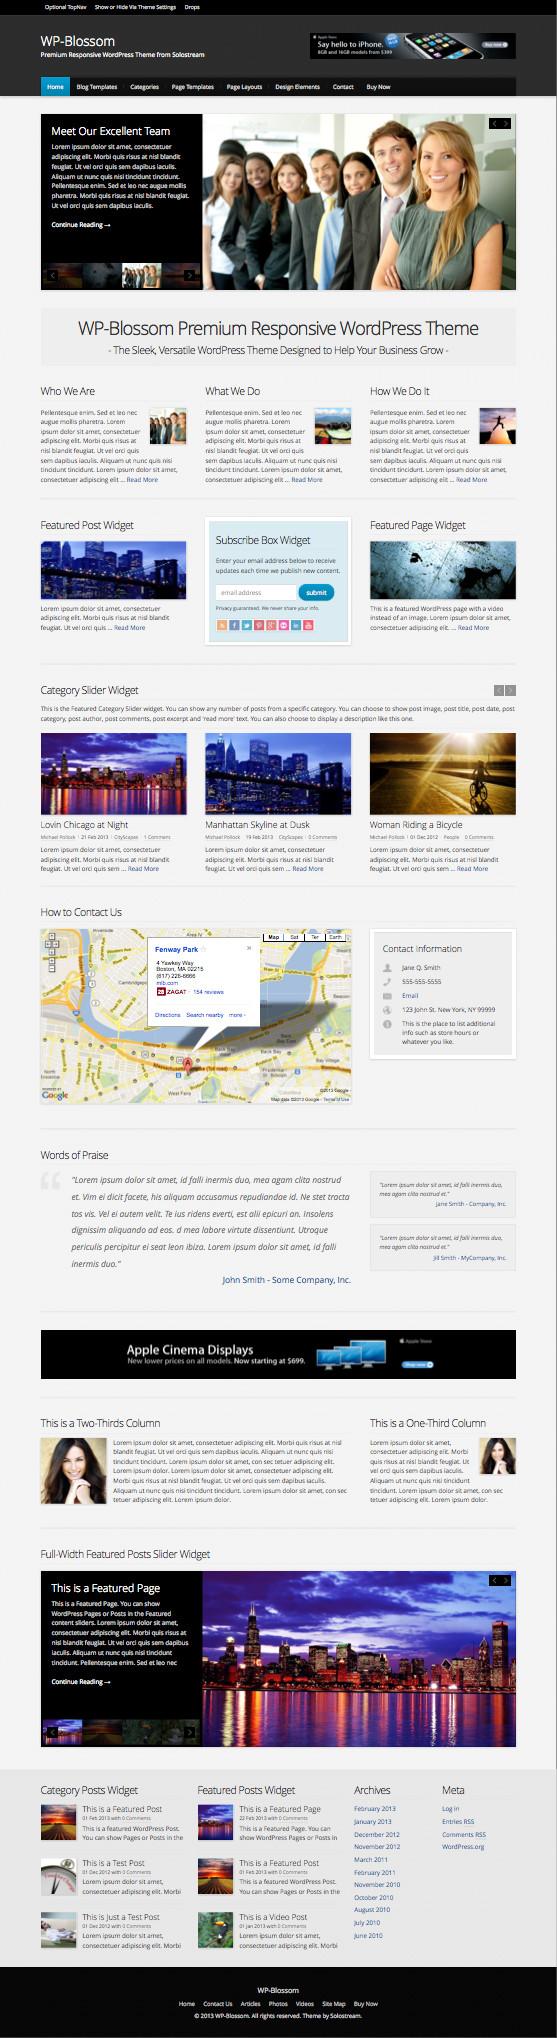 WP Blossom Responsive Business Magazine Theme